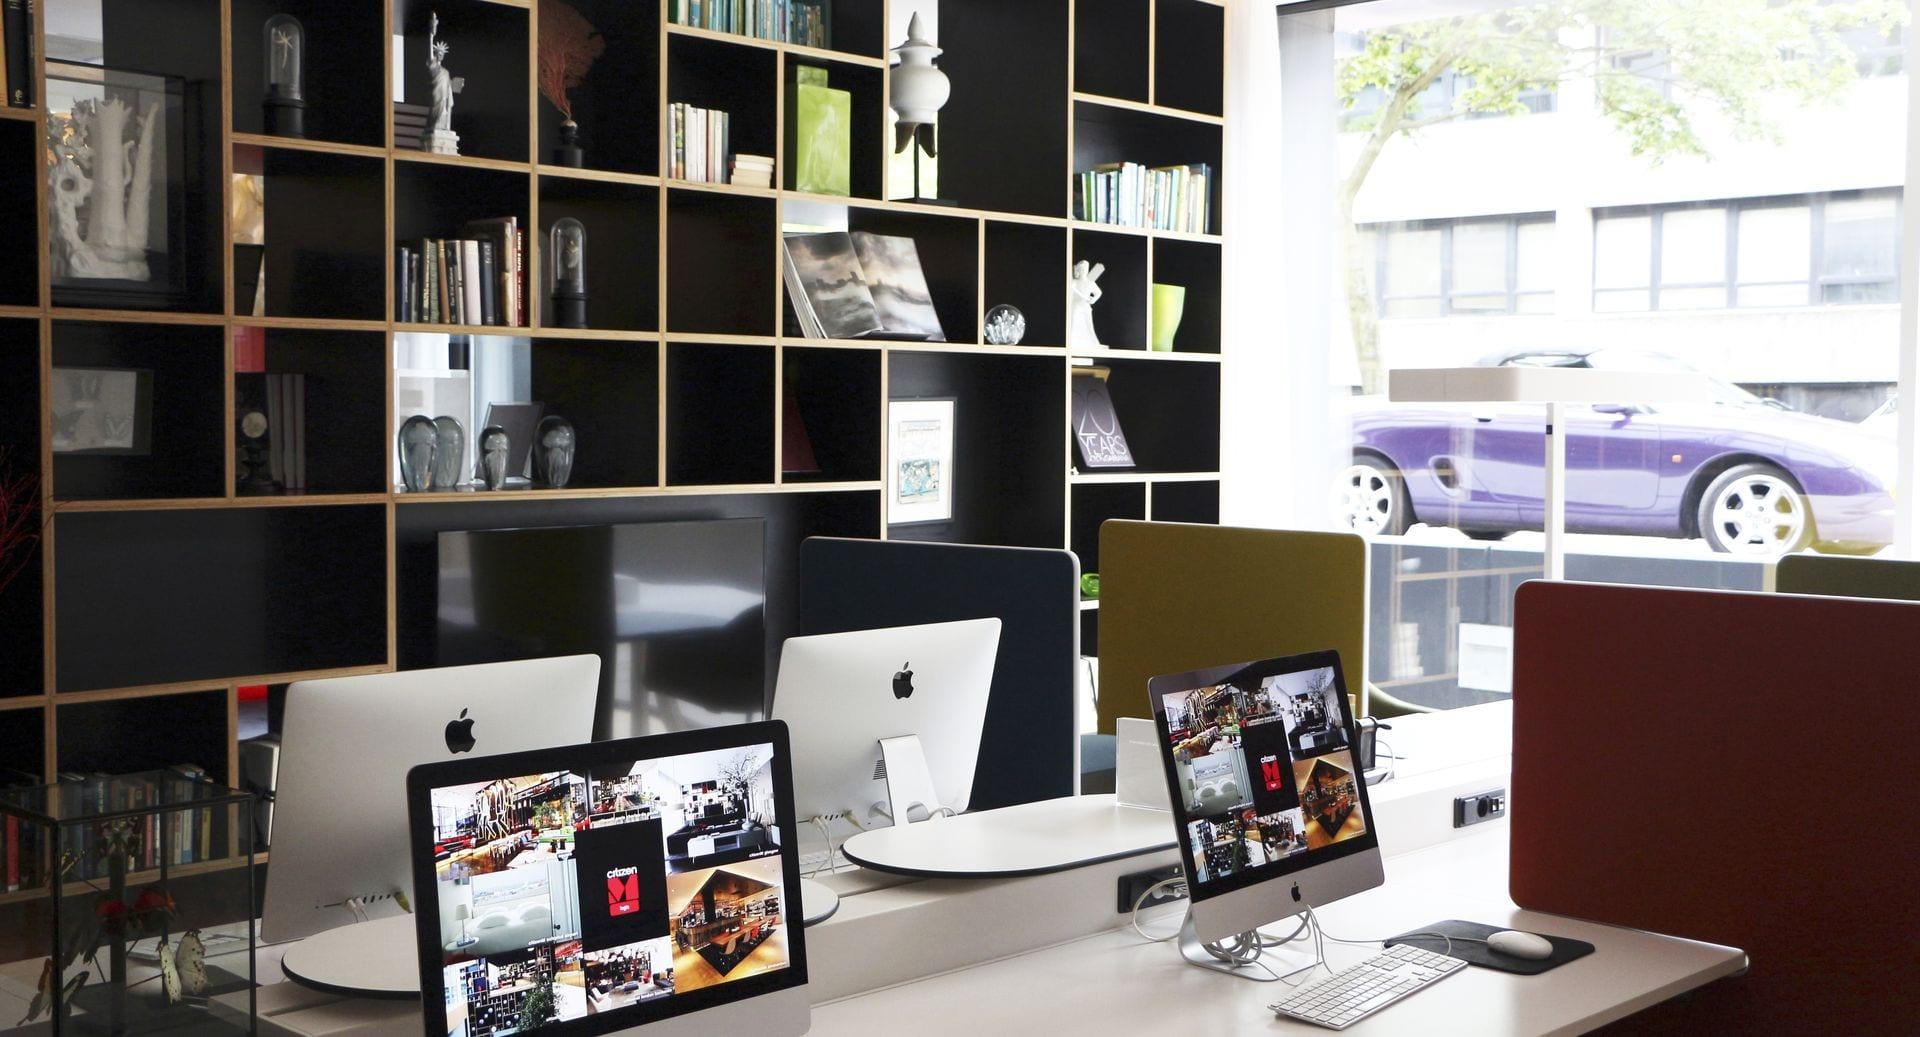 Citizenm amsterdam um hotel design econ mico sundaycooks for Design economico